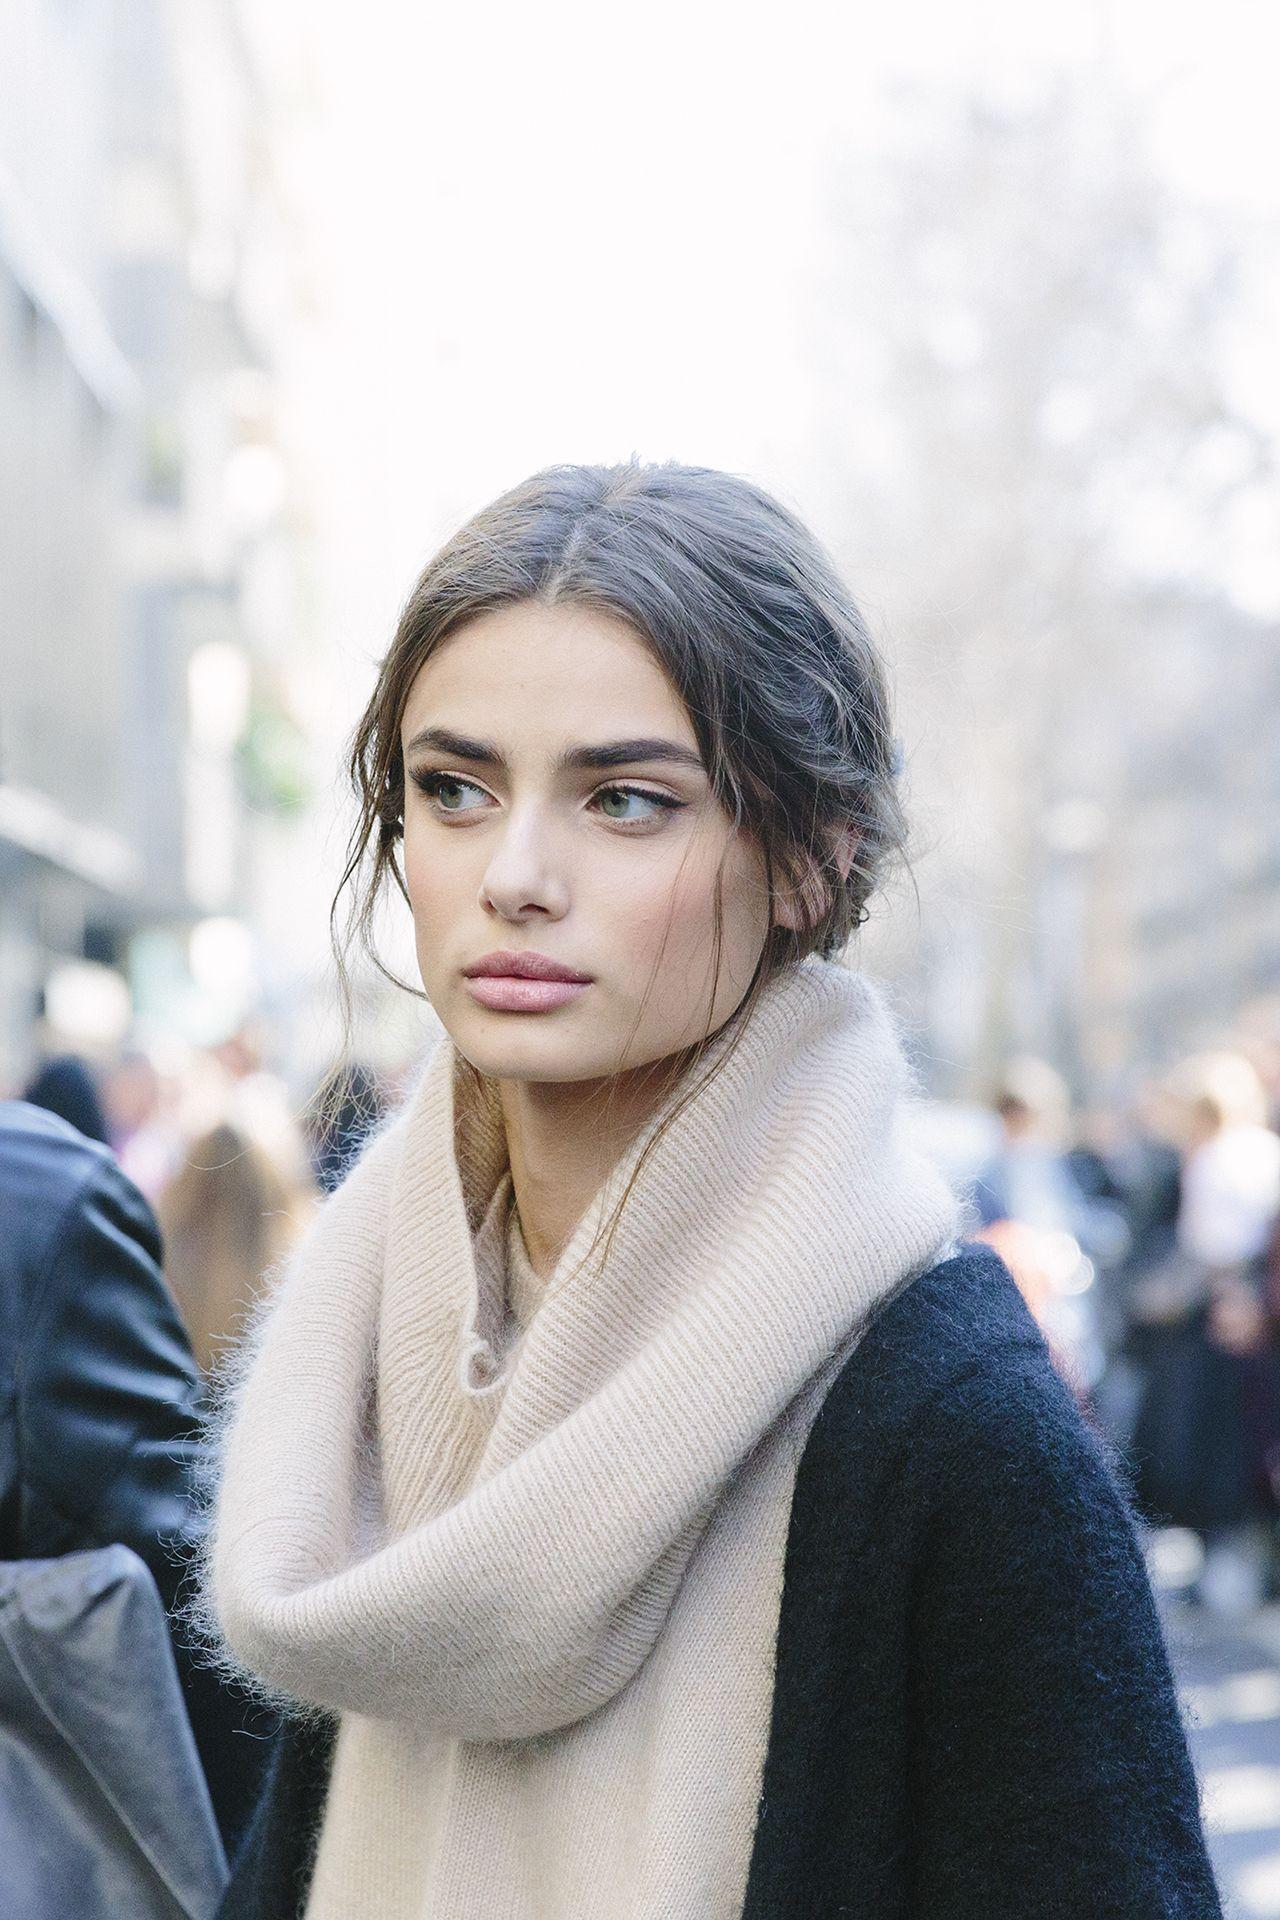 Pin De Anna Marbella Chin En Beauty Pinterest Maquillaje - Muchachas-guapas